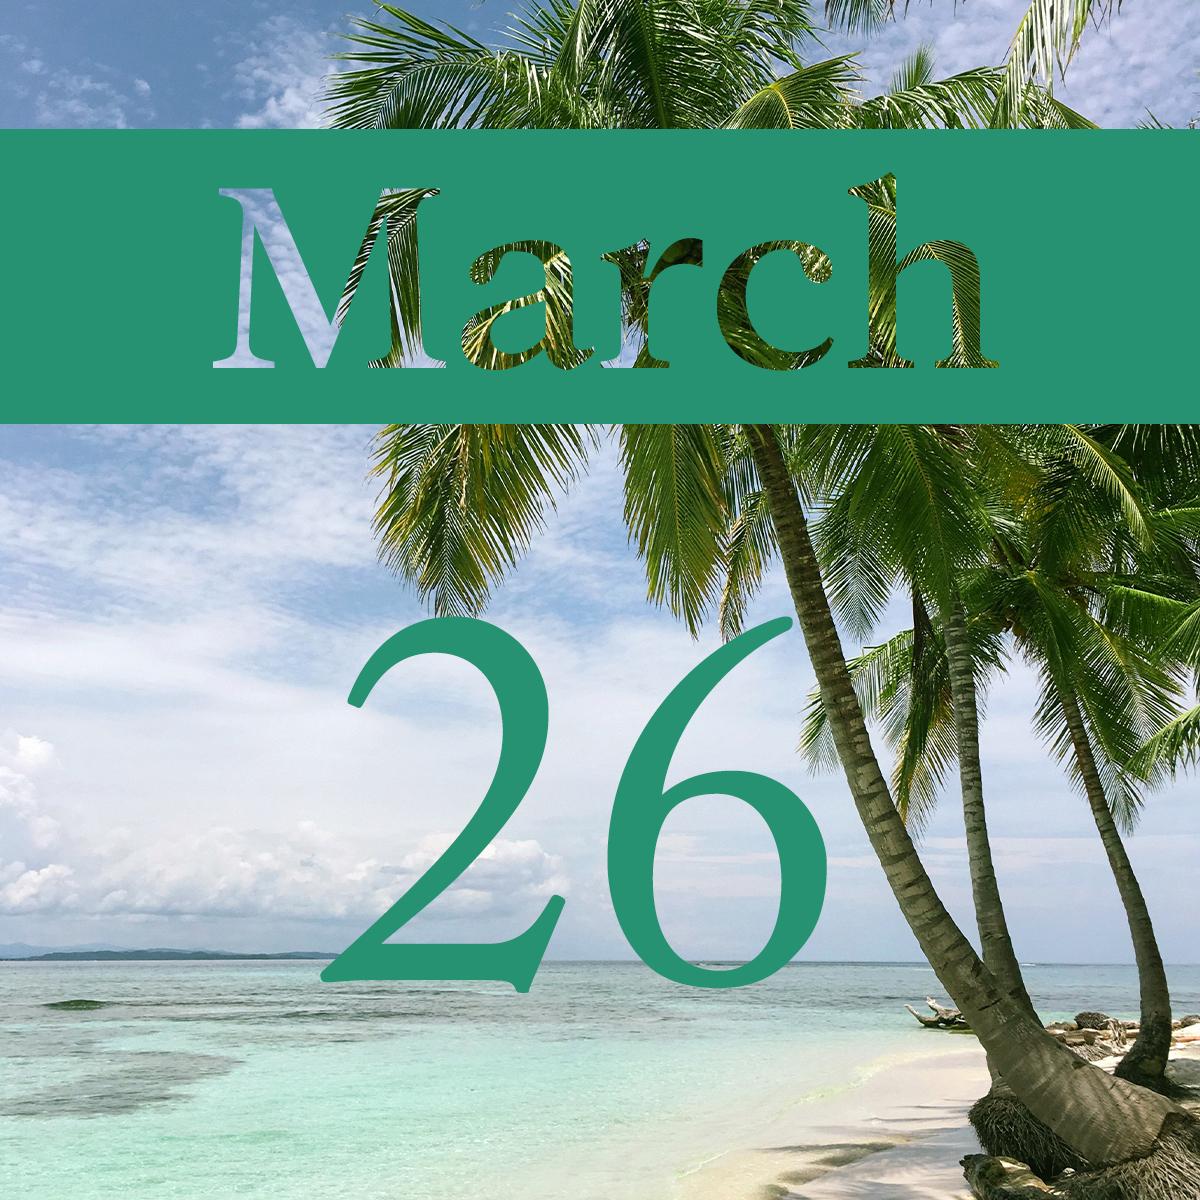 Thursday, March 26th